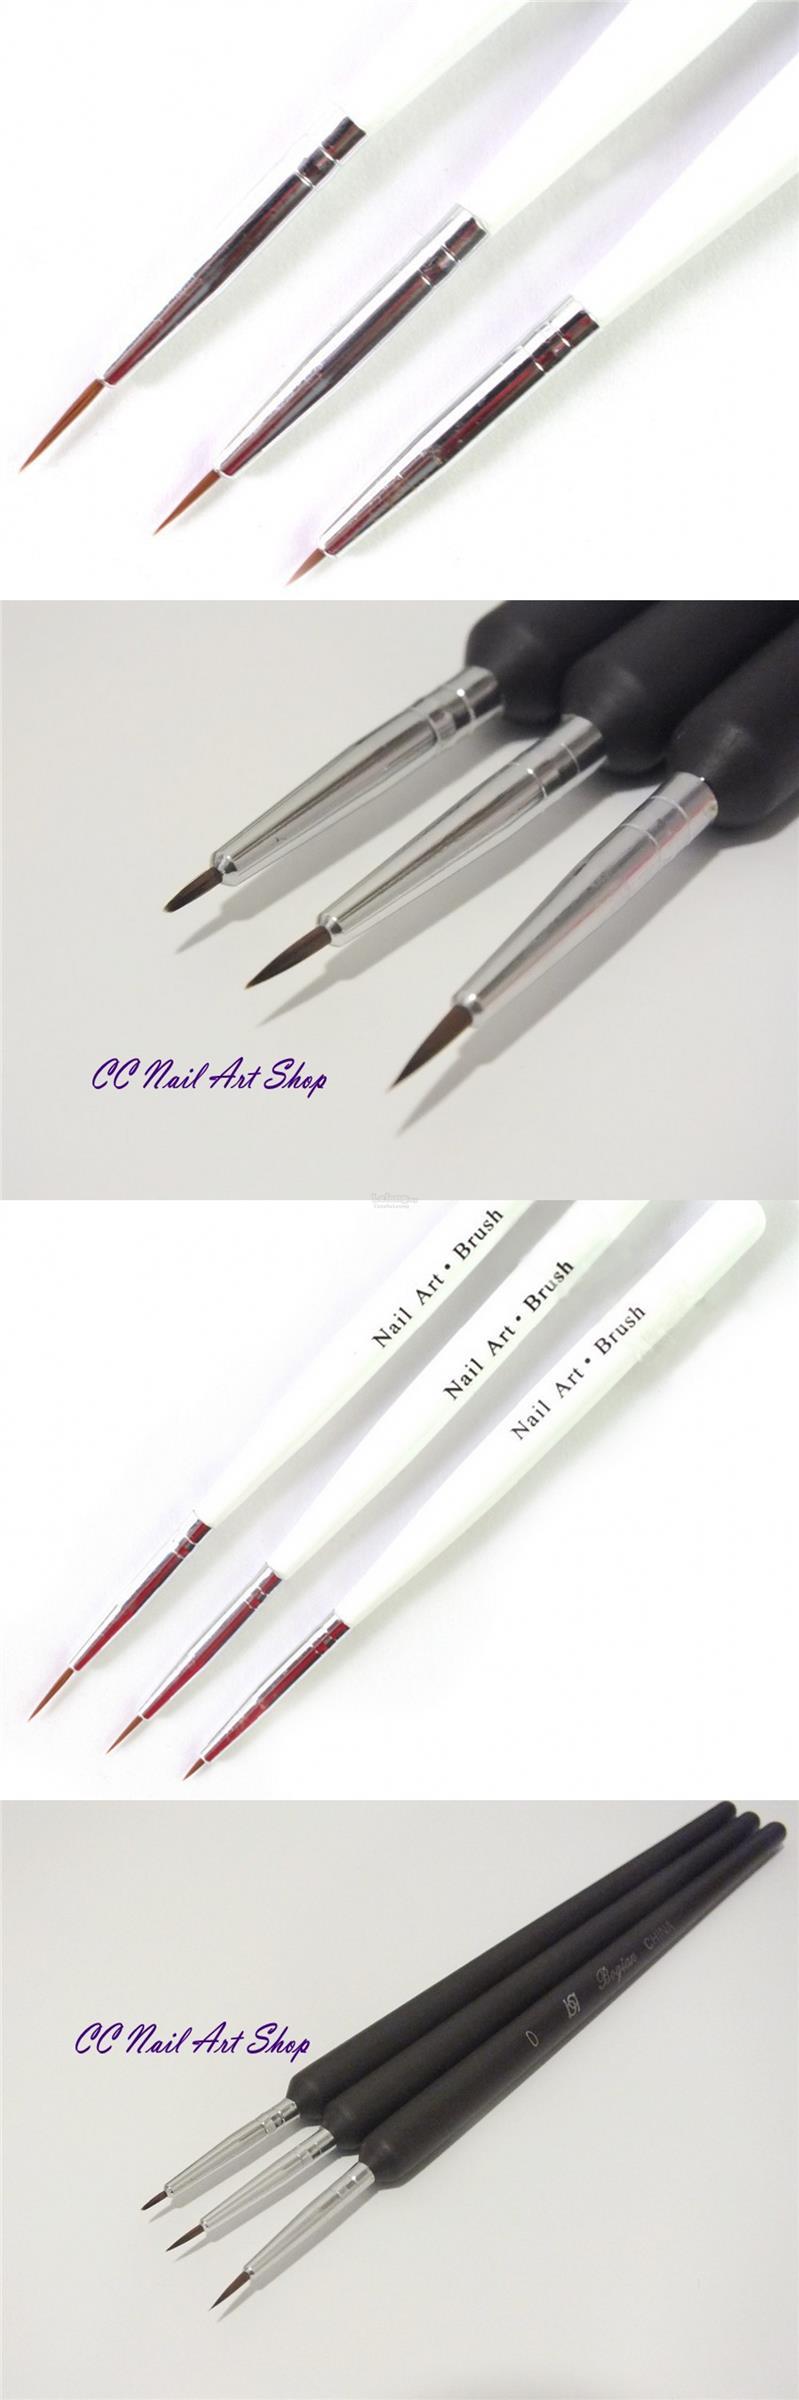 Nail Art Ideas Fine Detail Nail Art Brush Pictures Of Nail Art